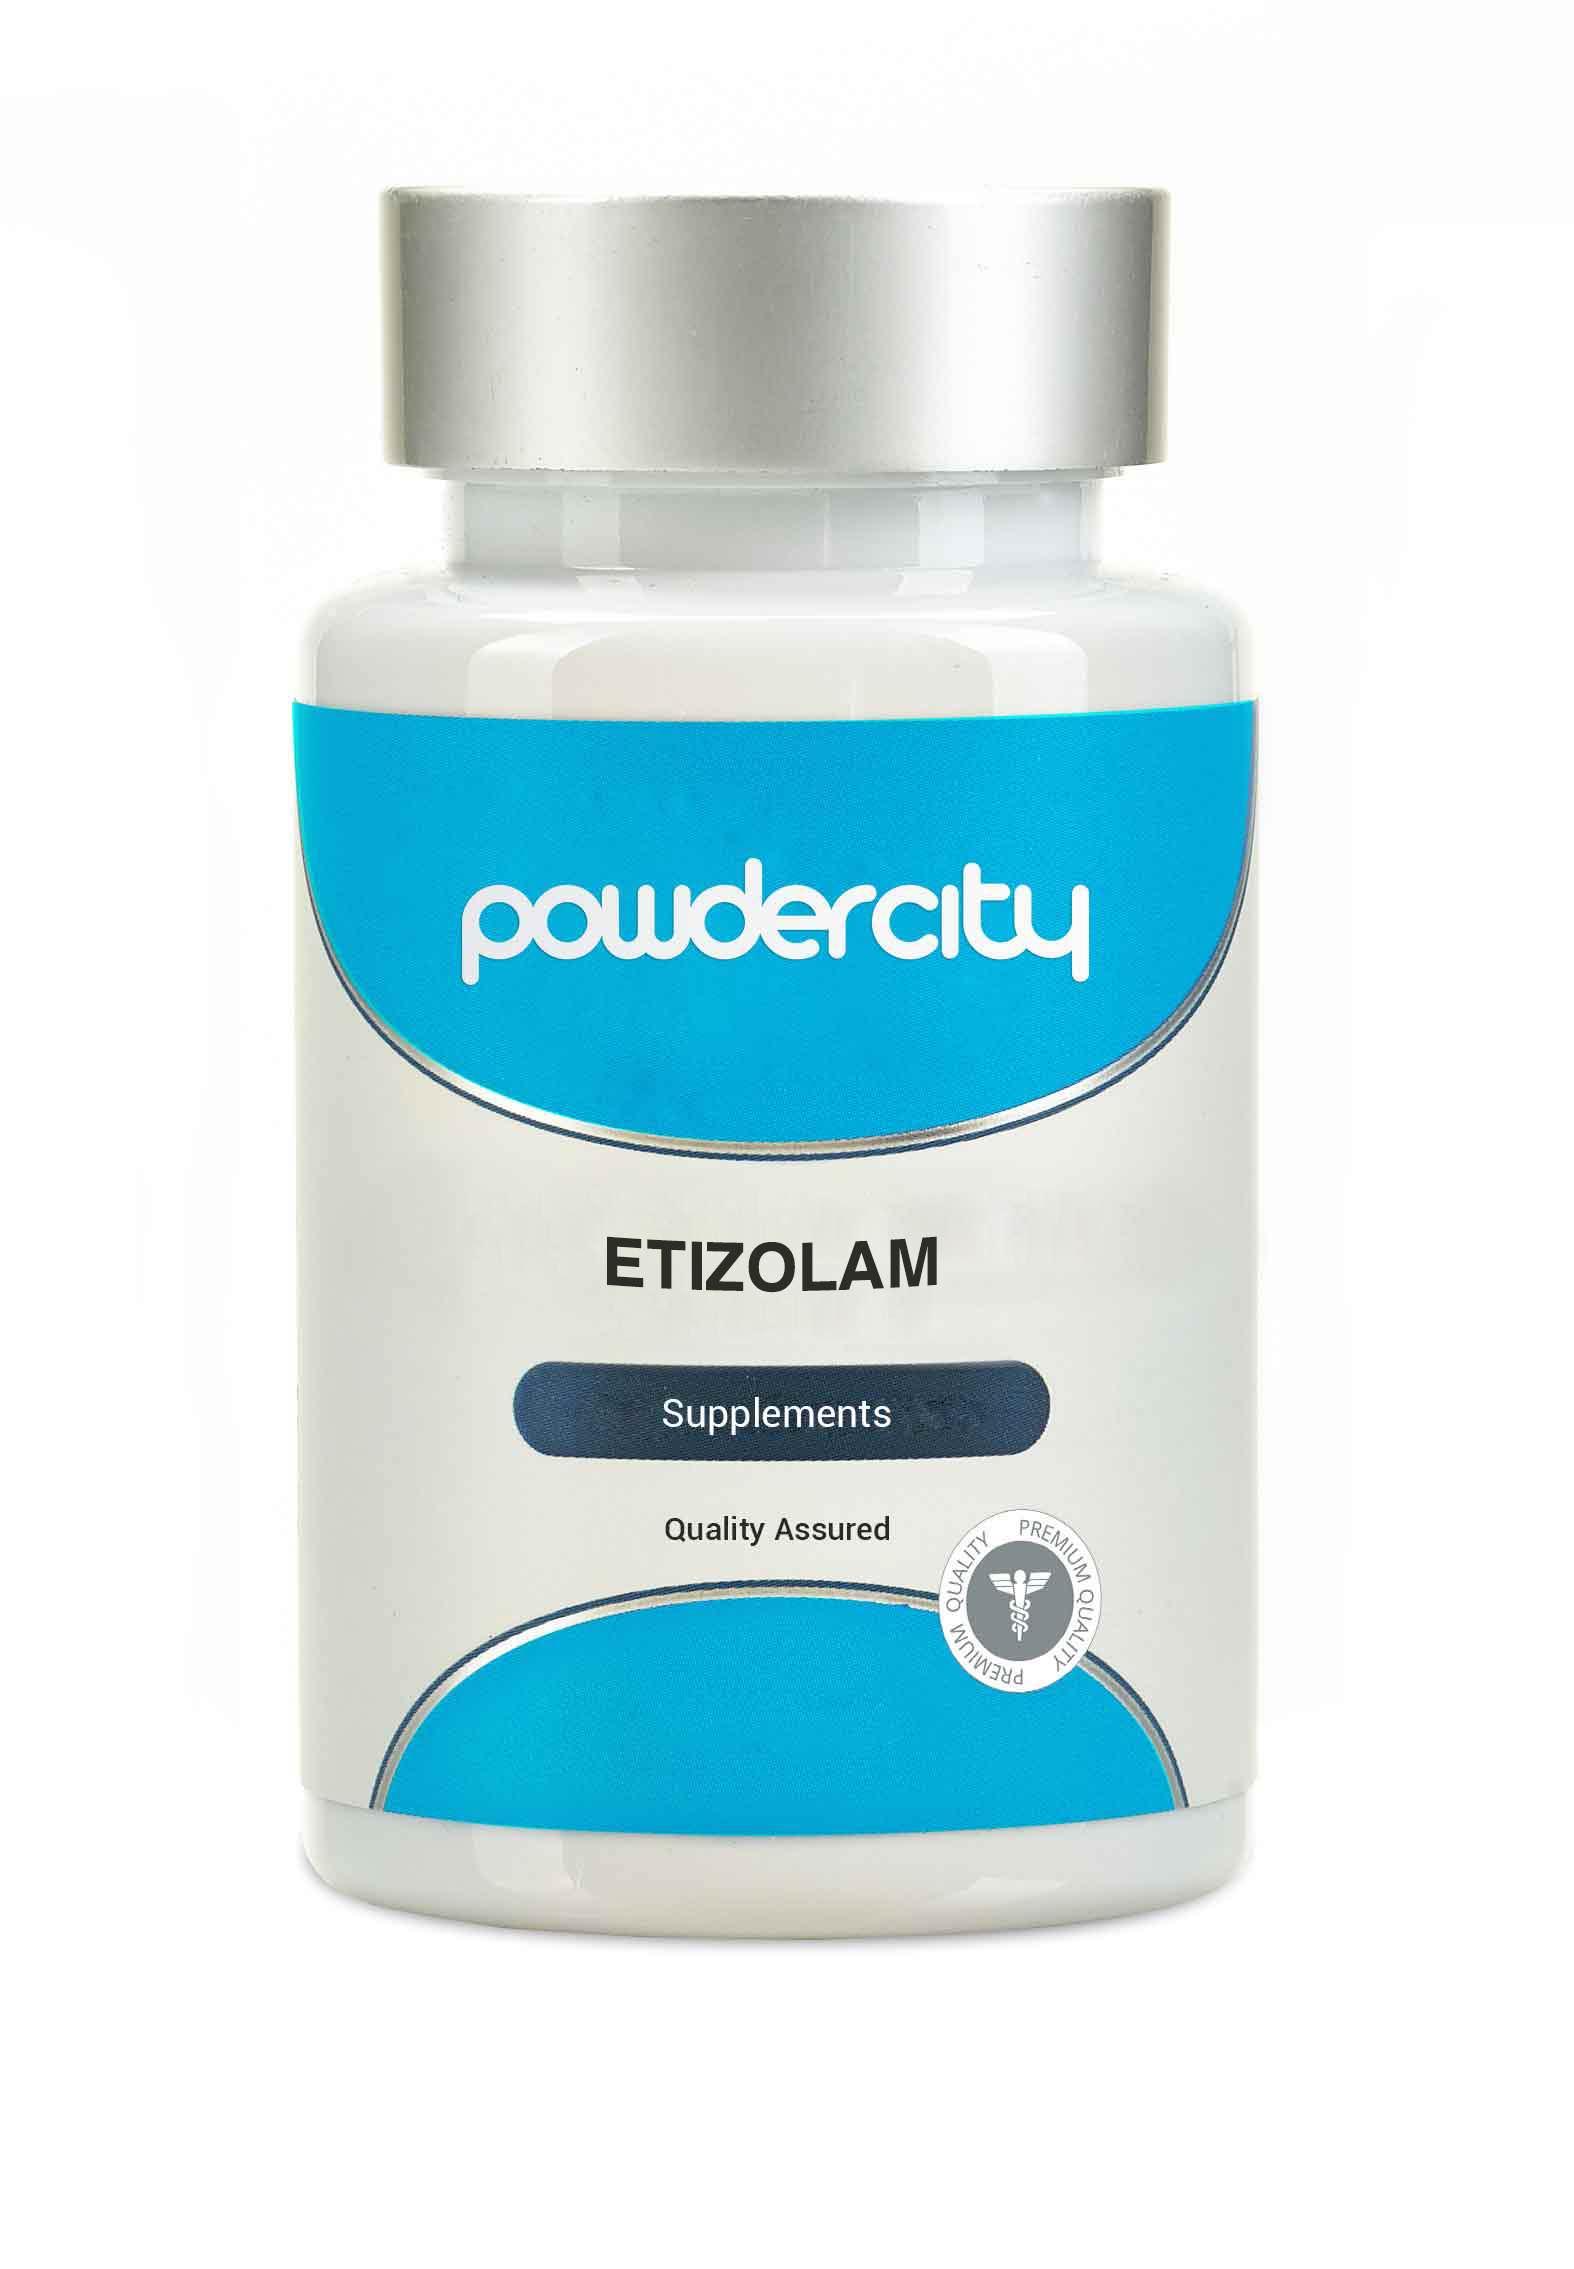 Buy Etizolam Online | Dosage, Side Effects, Dangers, Science